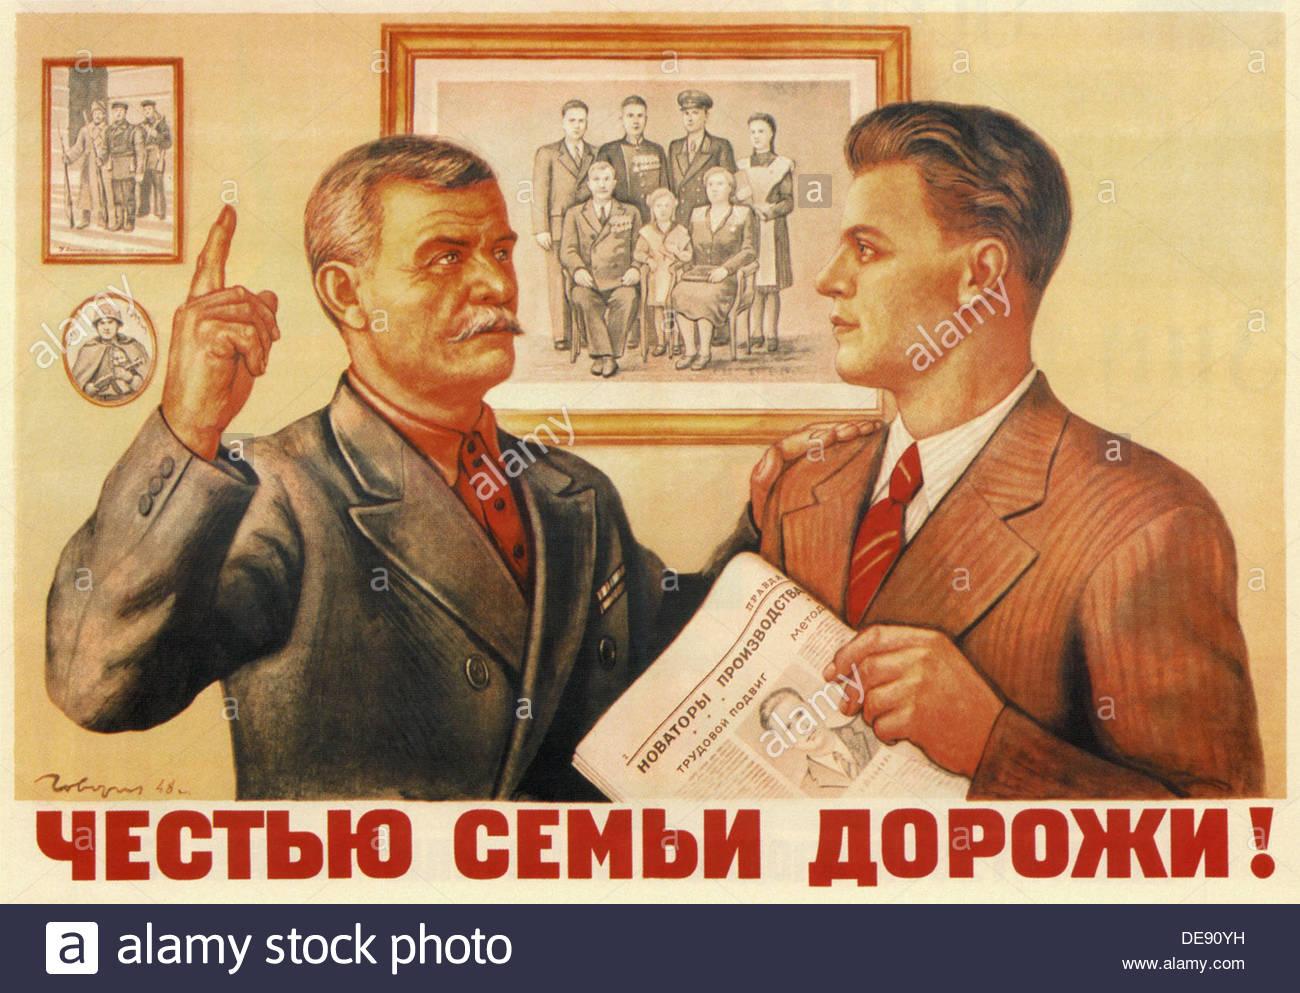 Chérir l'honneur de la famille!, 1949. Artiste: Govorkov Iwanovich (1906-1974, Viktor) Photo Stock